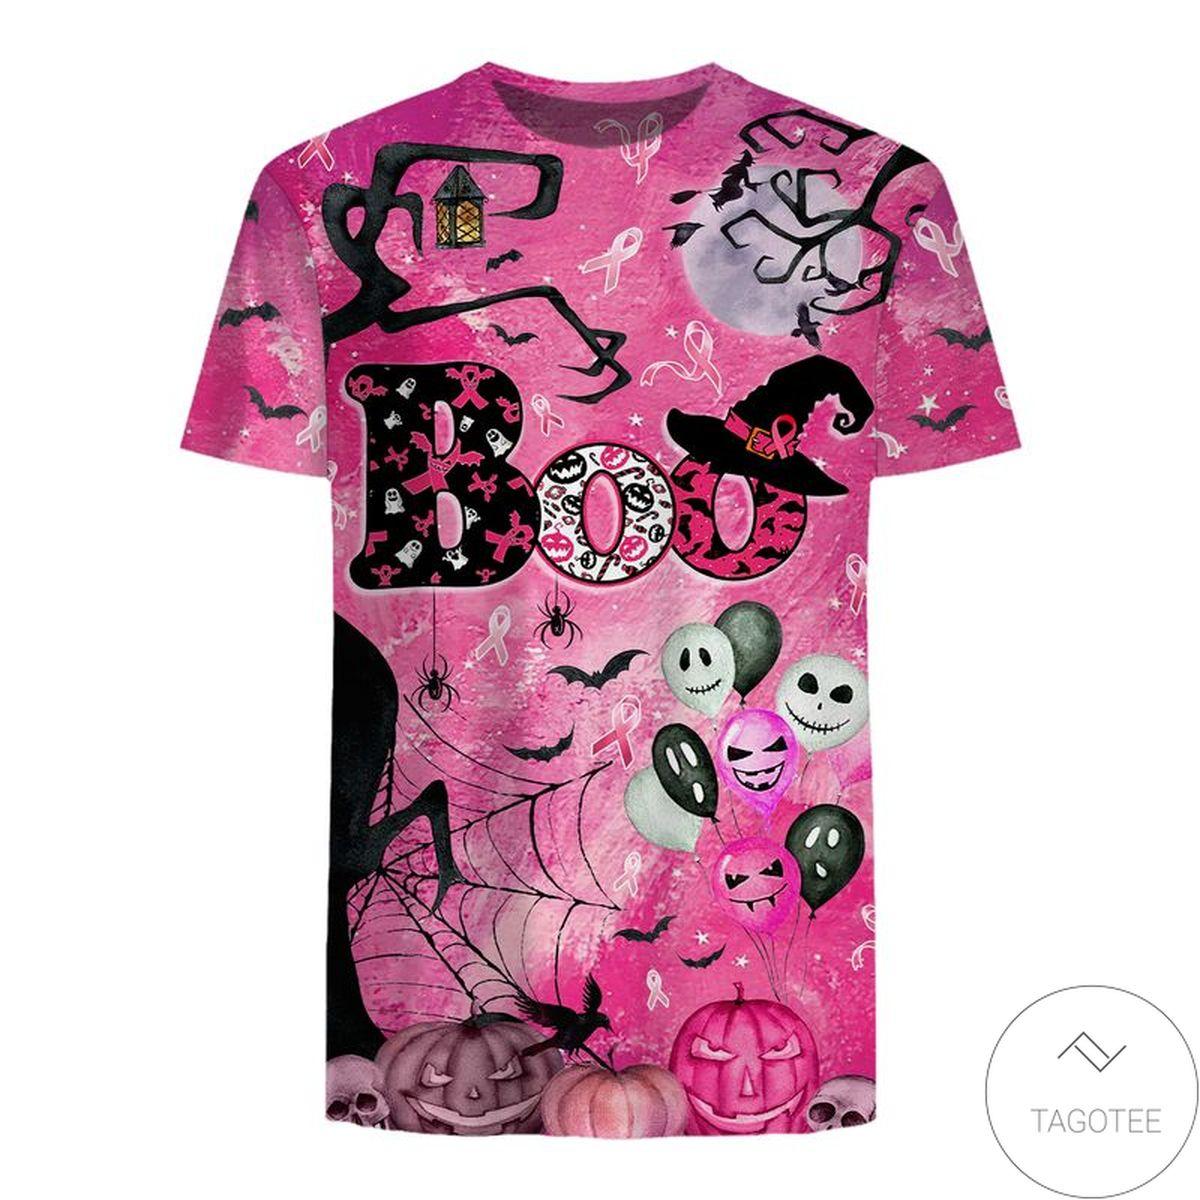 Perfect Boo Halloween Theme Pink 3D T-Shirt